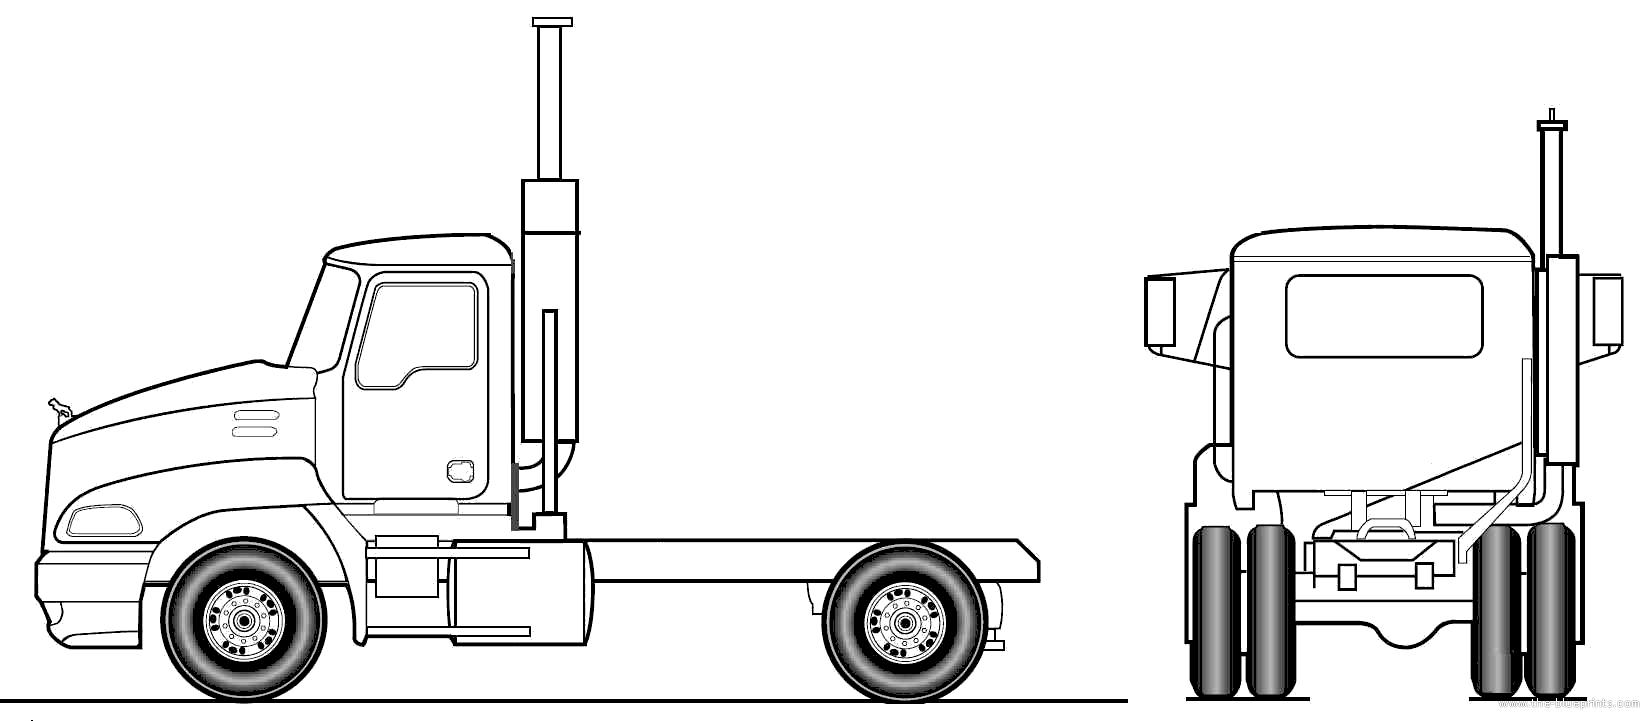 Blueprints > Trucks > Mack > Mack Pinnacle Axle Back